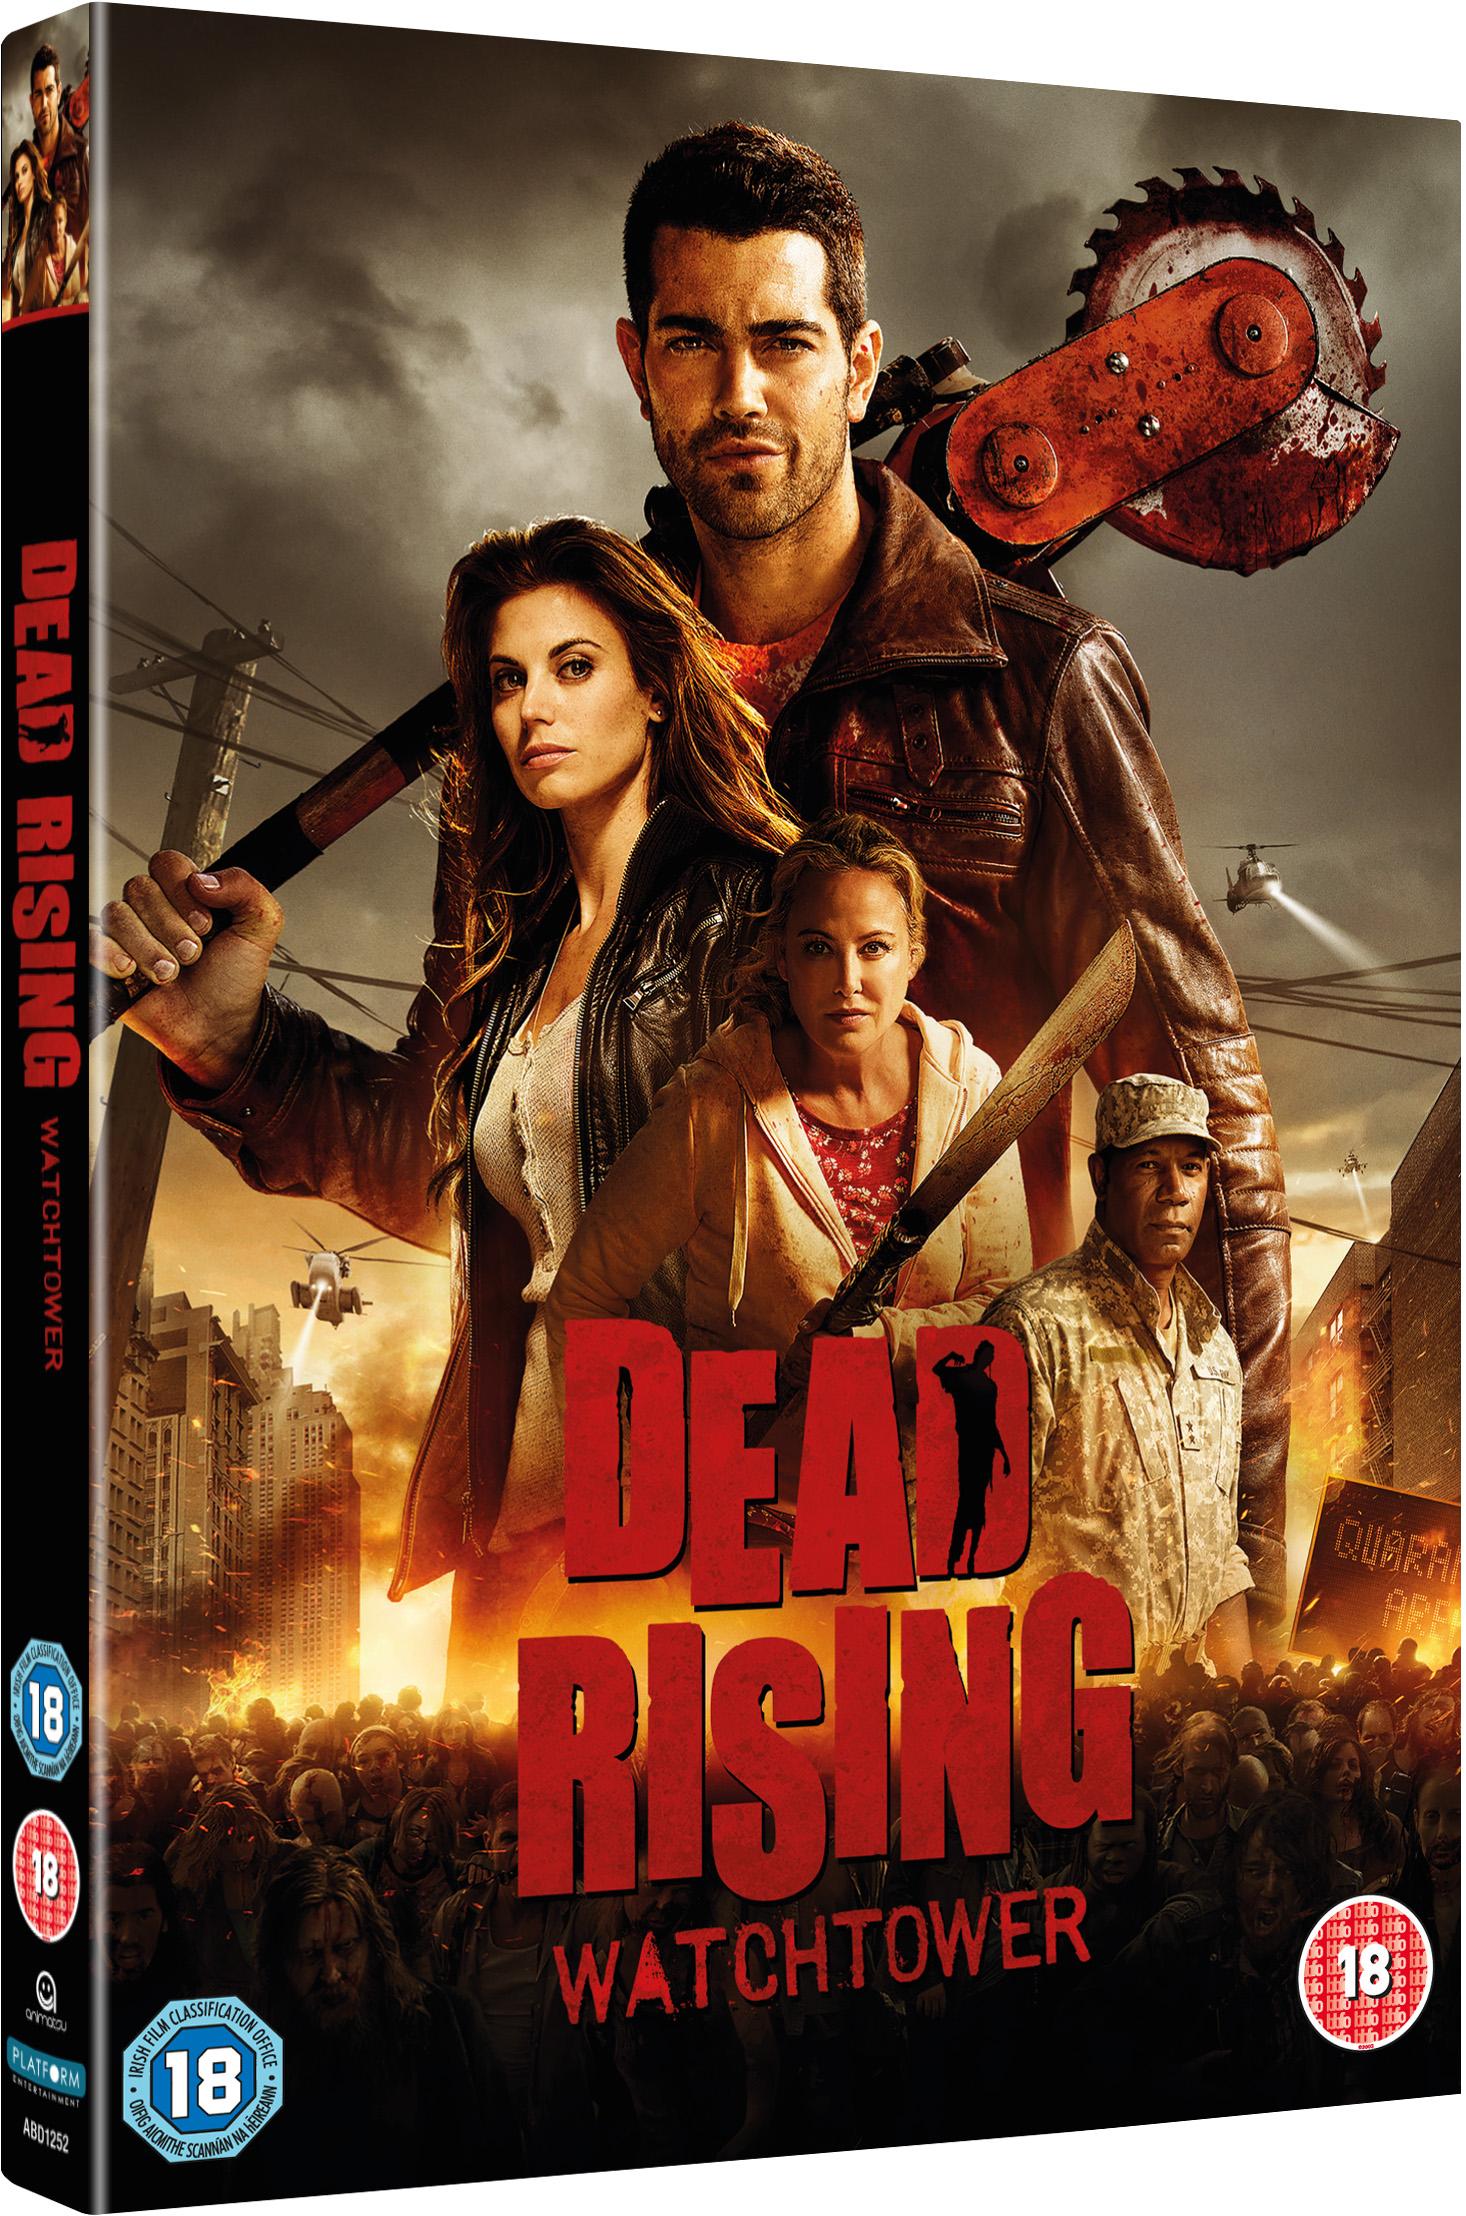 Dead Rising Watchtower 2015 Photo Gallery Imdb